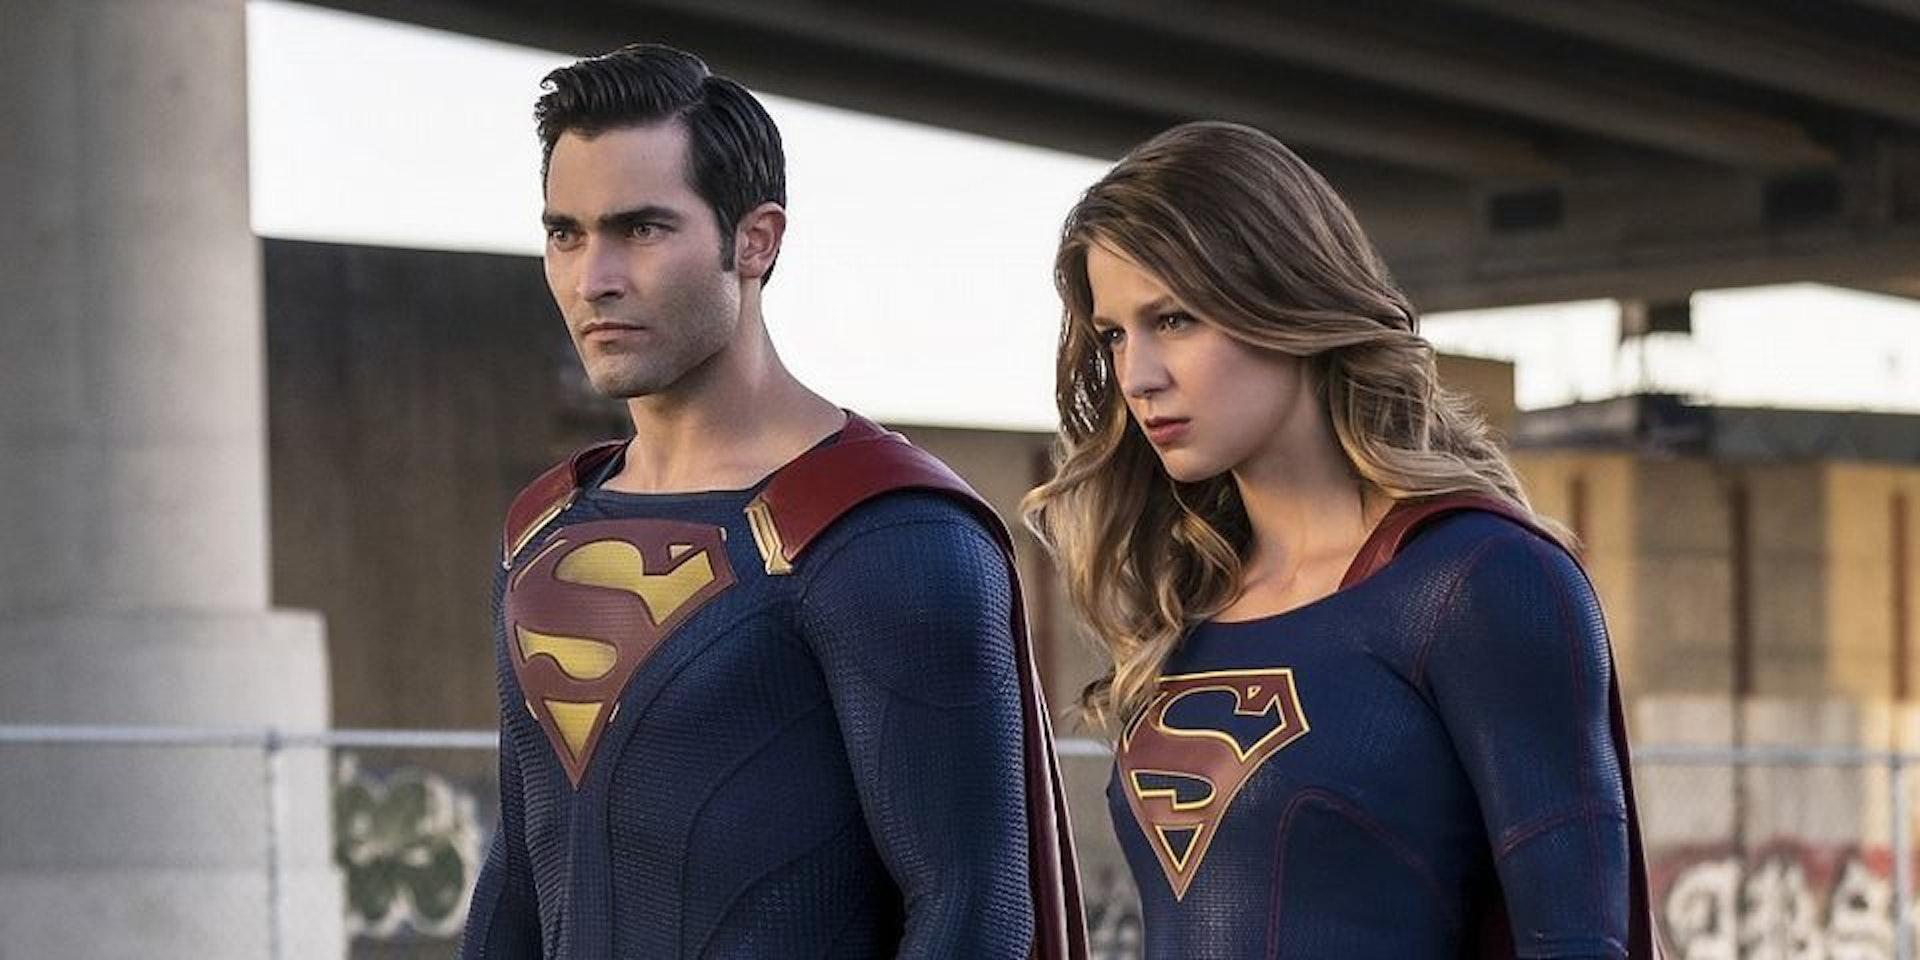 Tyler Hoechlin as Superman and Mellisa Bennoist as Supergirl on CW's Supergirl